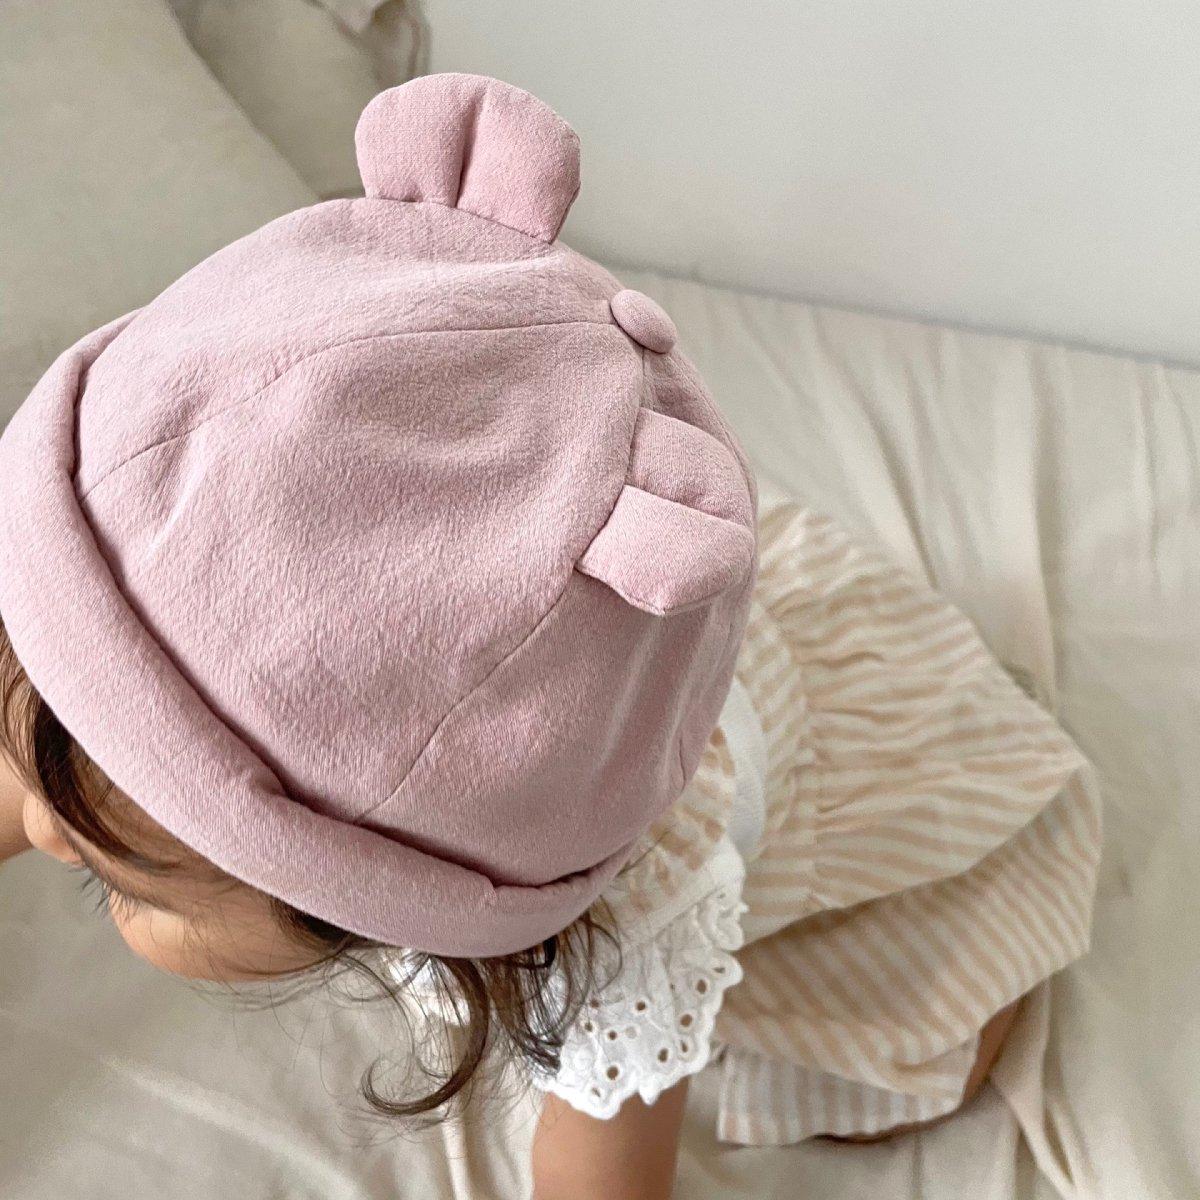 【BABY】Baby Linen Bear Cap 詳細画像23